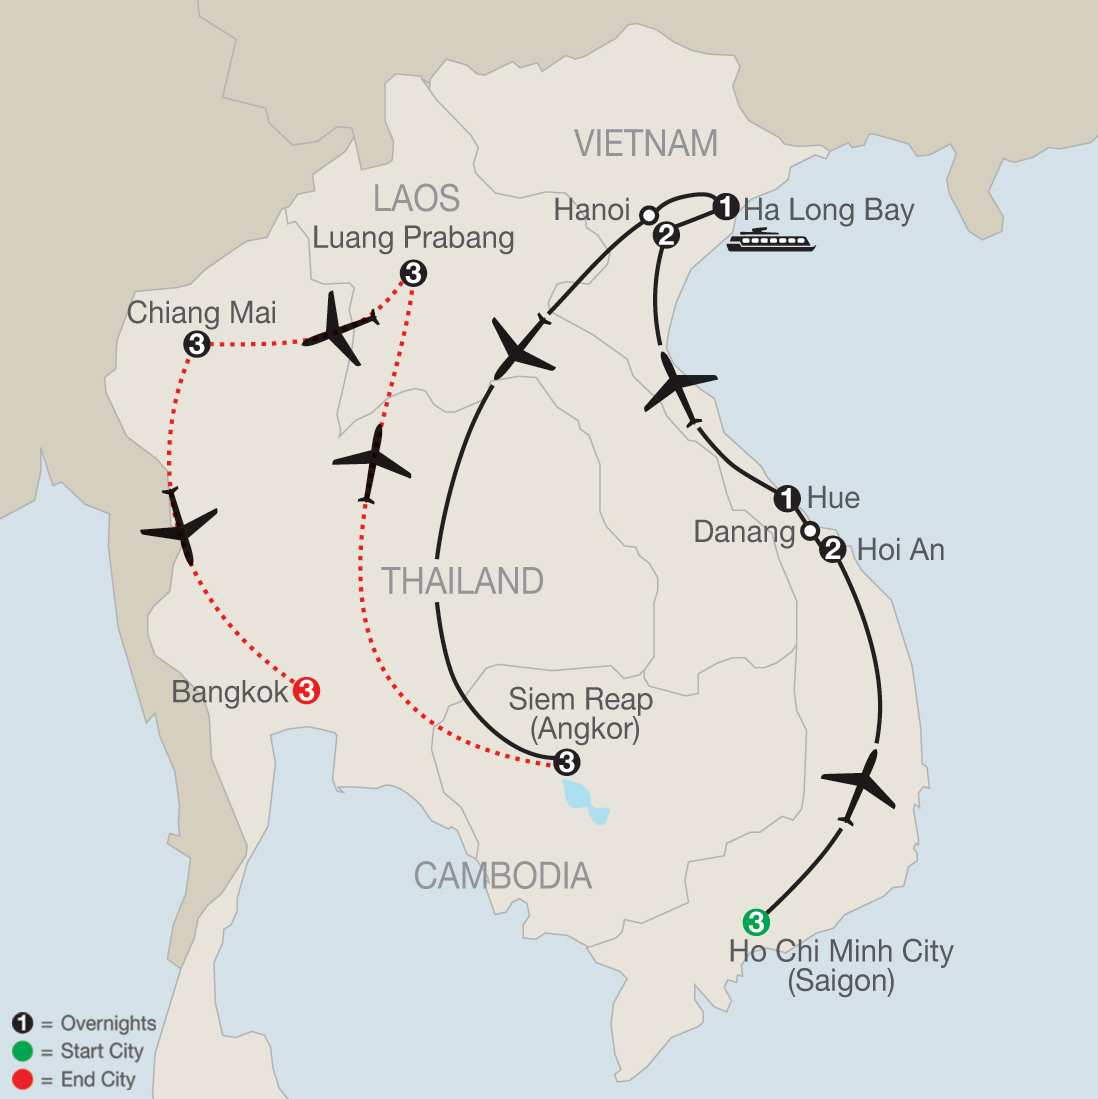 Exploring Vietnam & Cambodia with Luang Prabang, Chiang Mai & Bangkok map